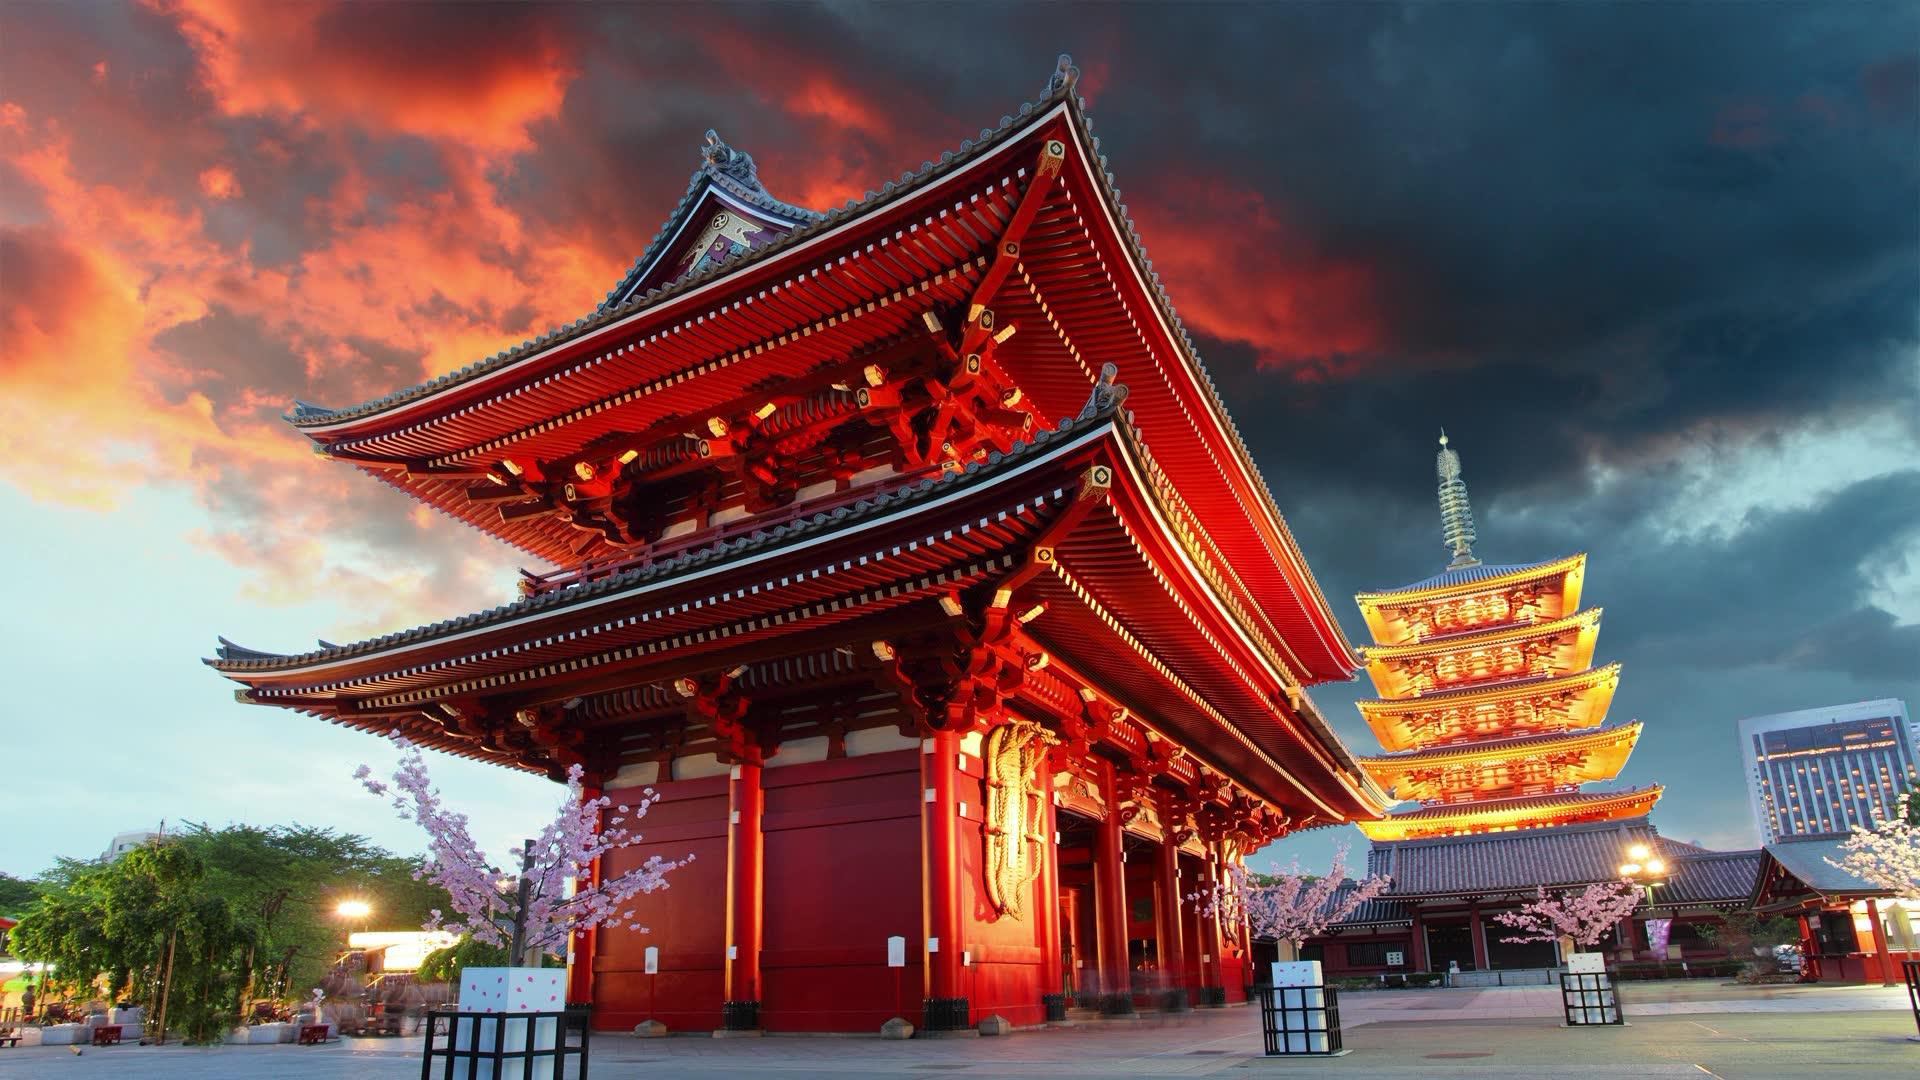 Sanctuaire Asakusa, Asakusa, Taito, Tokyo, Japan in Japan is surreal